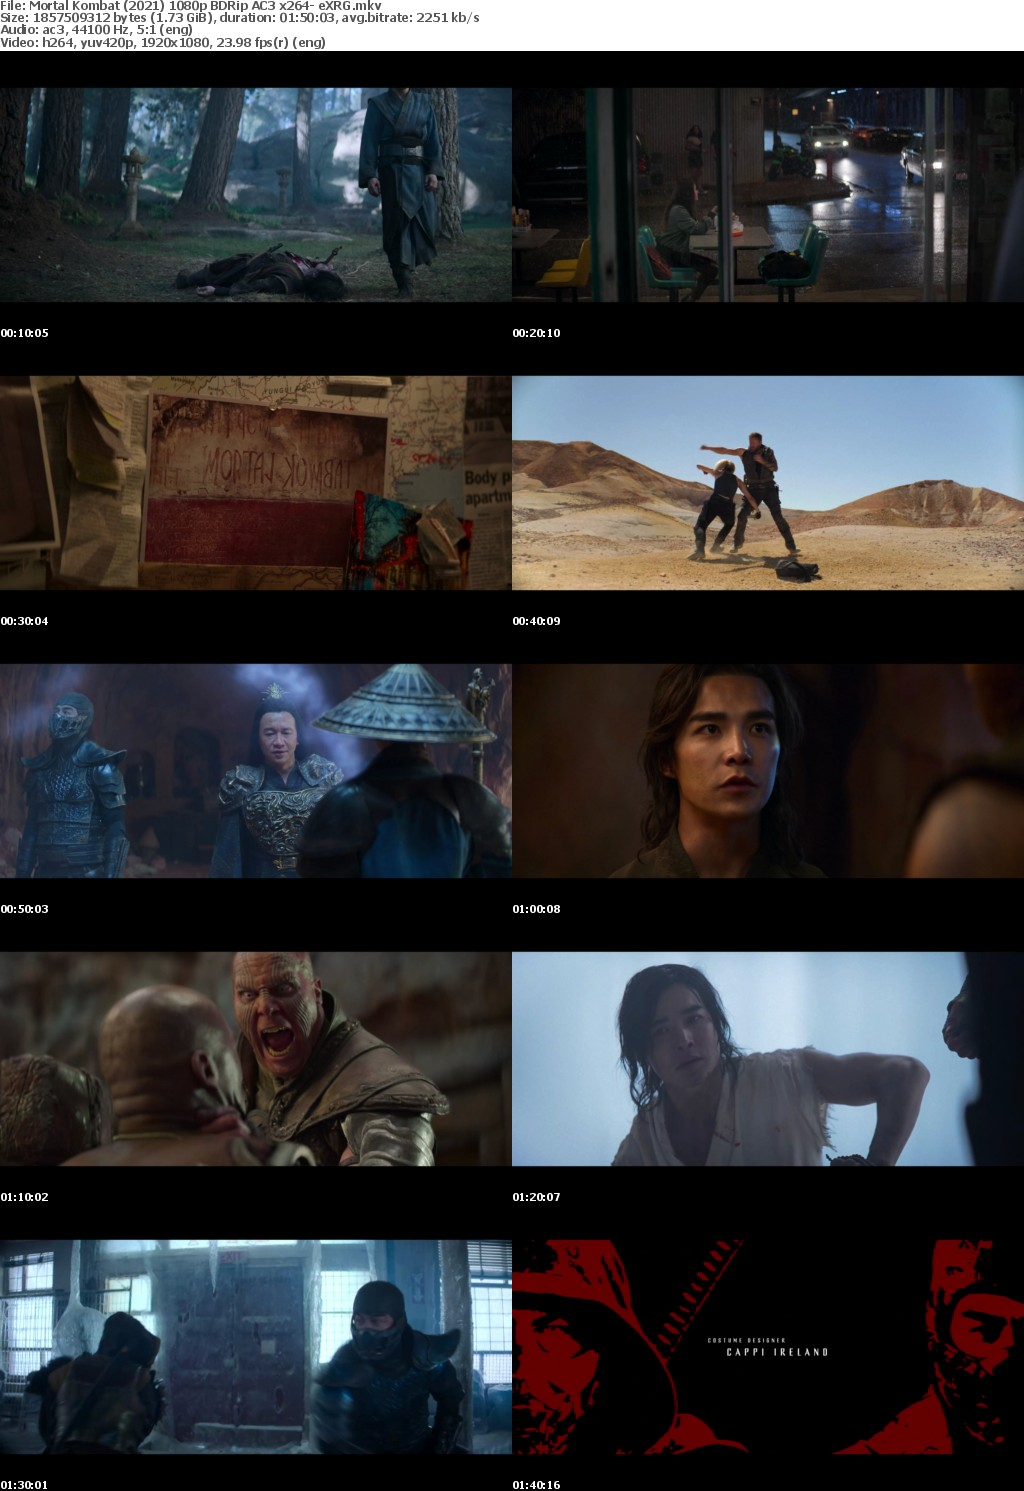 Mortal Kombat (2021) 1080p BDRip AC3 x264- eXRG